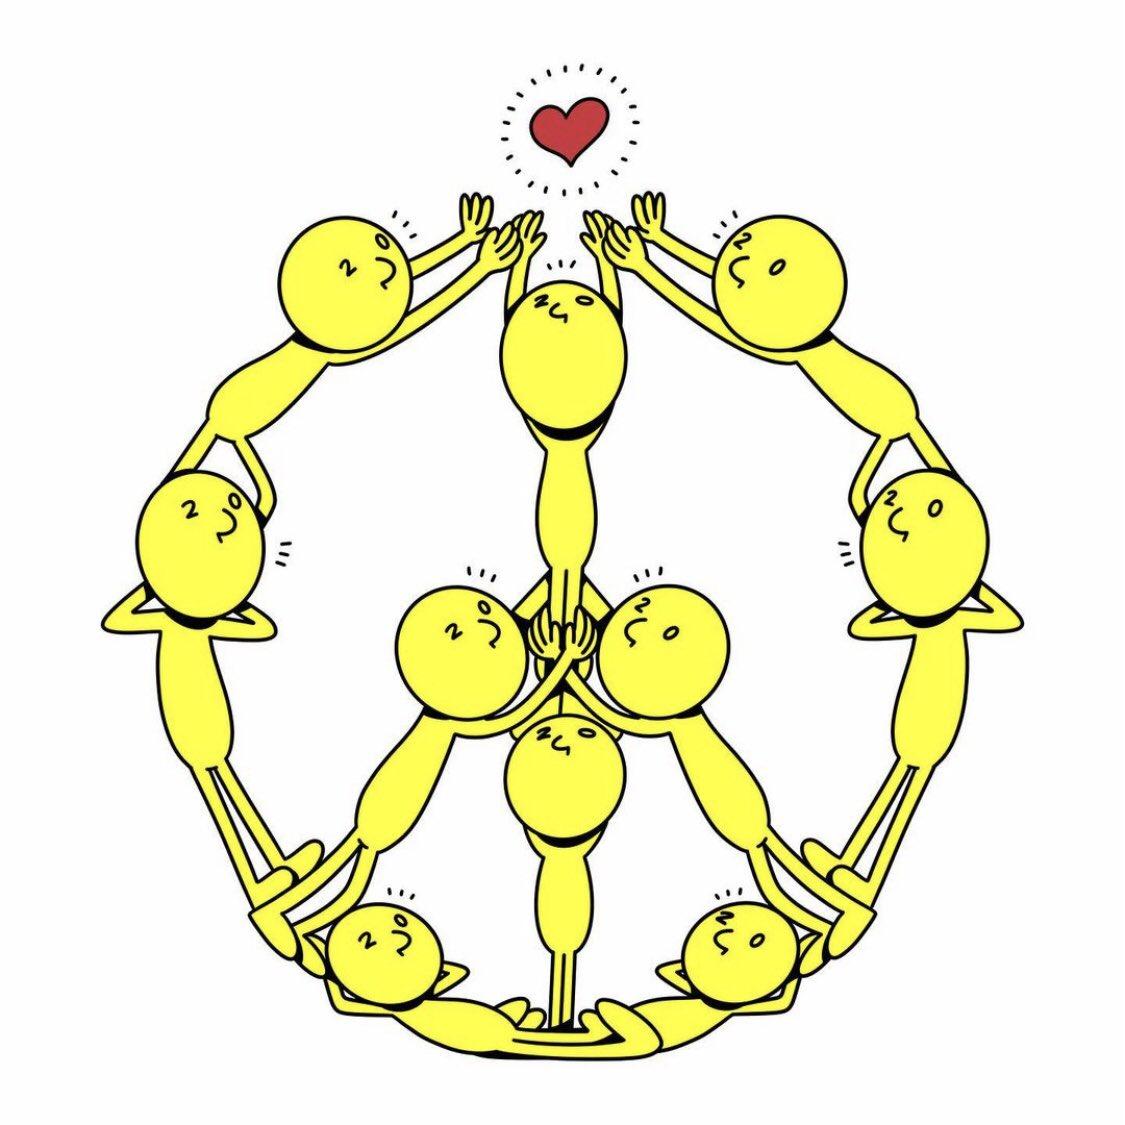 Keep searching for it ☮️💛  #illustration #cartoon #peace #peaceful #peacesign #love #pomi #pomi240